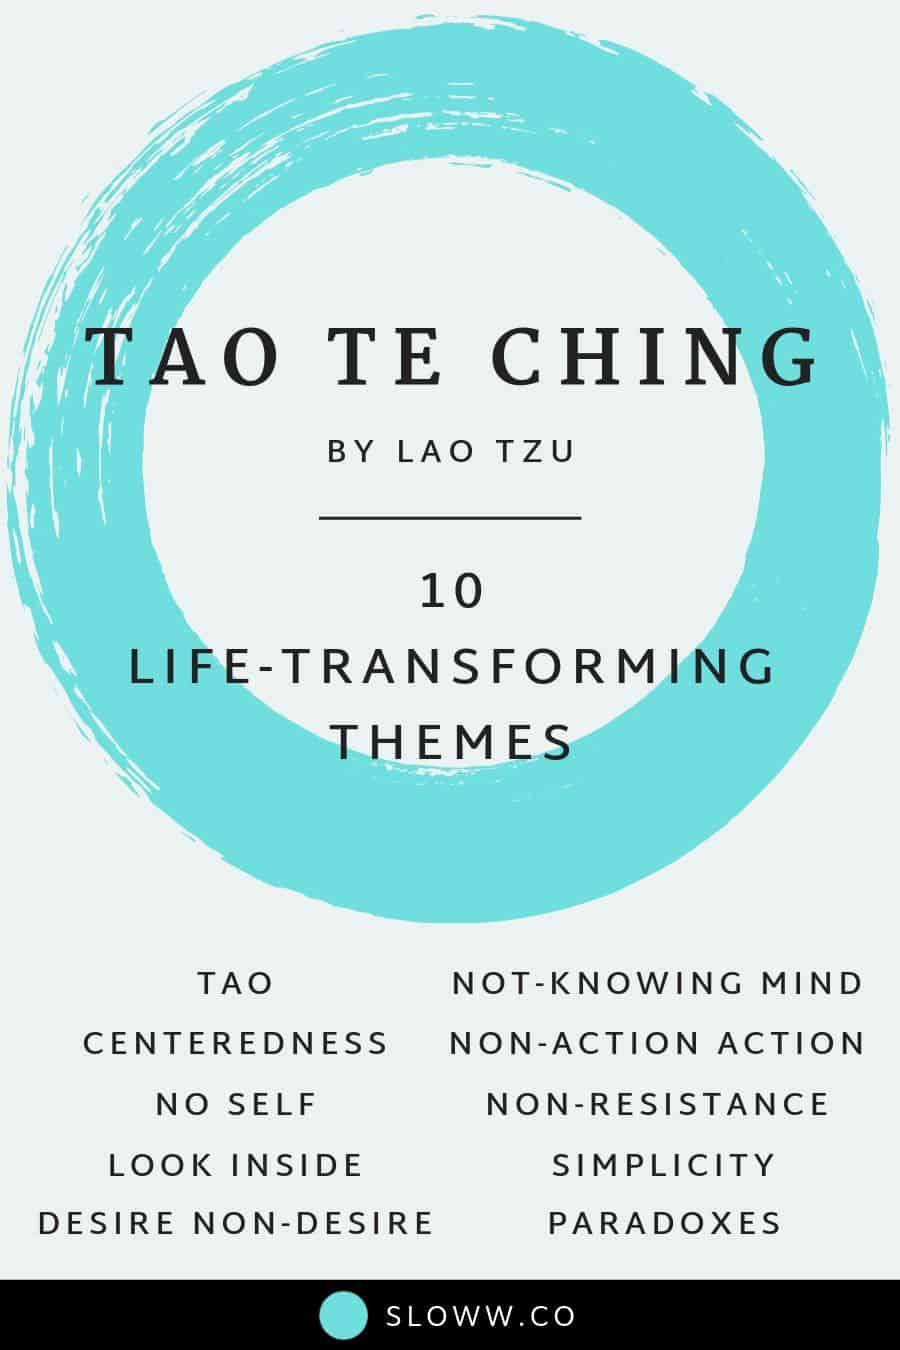 Sloww Tao Te Ching Lao Tzu Themes Infographic